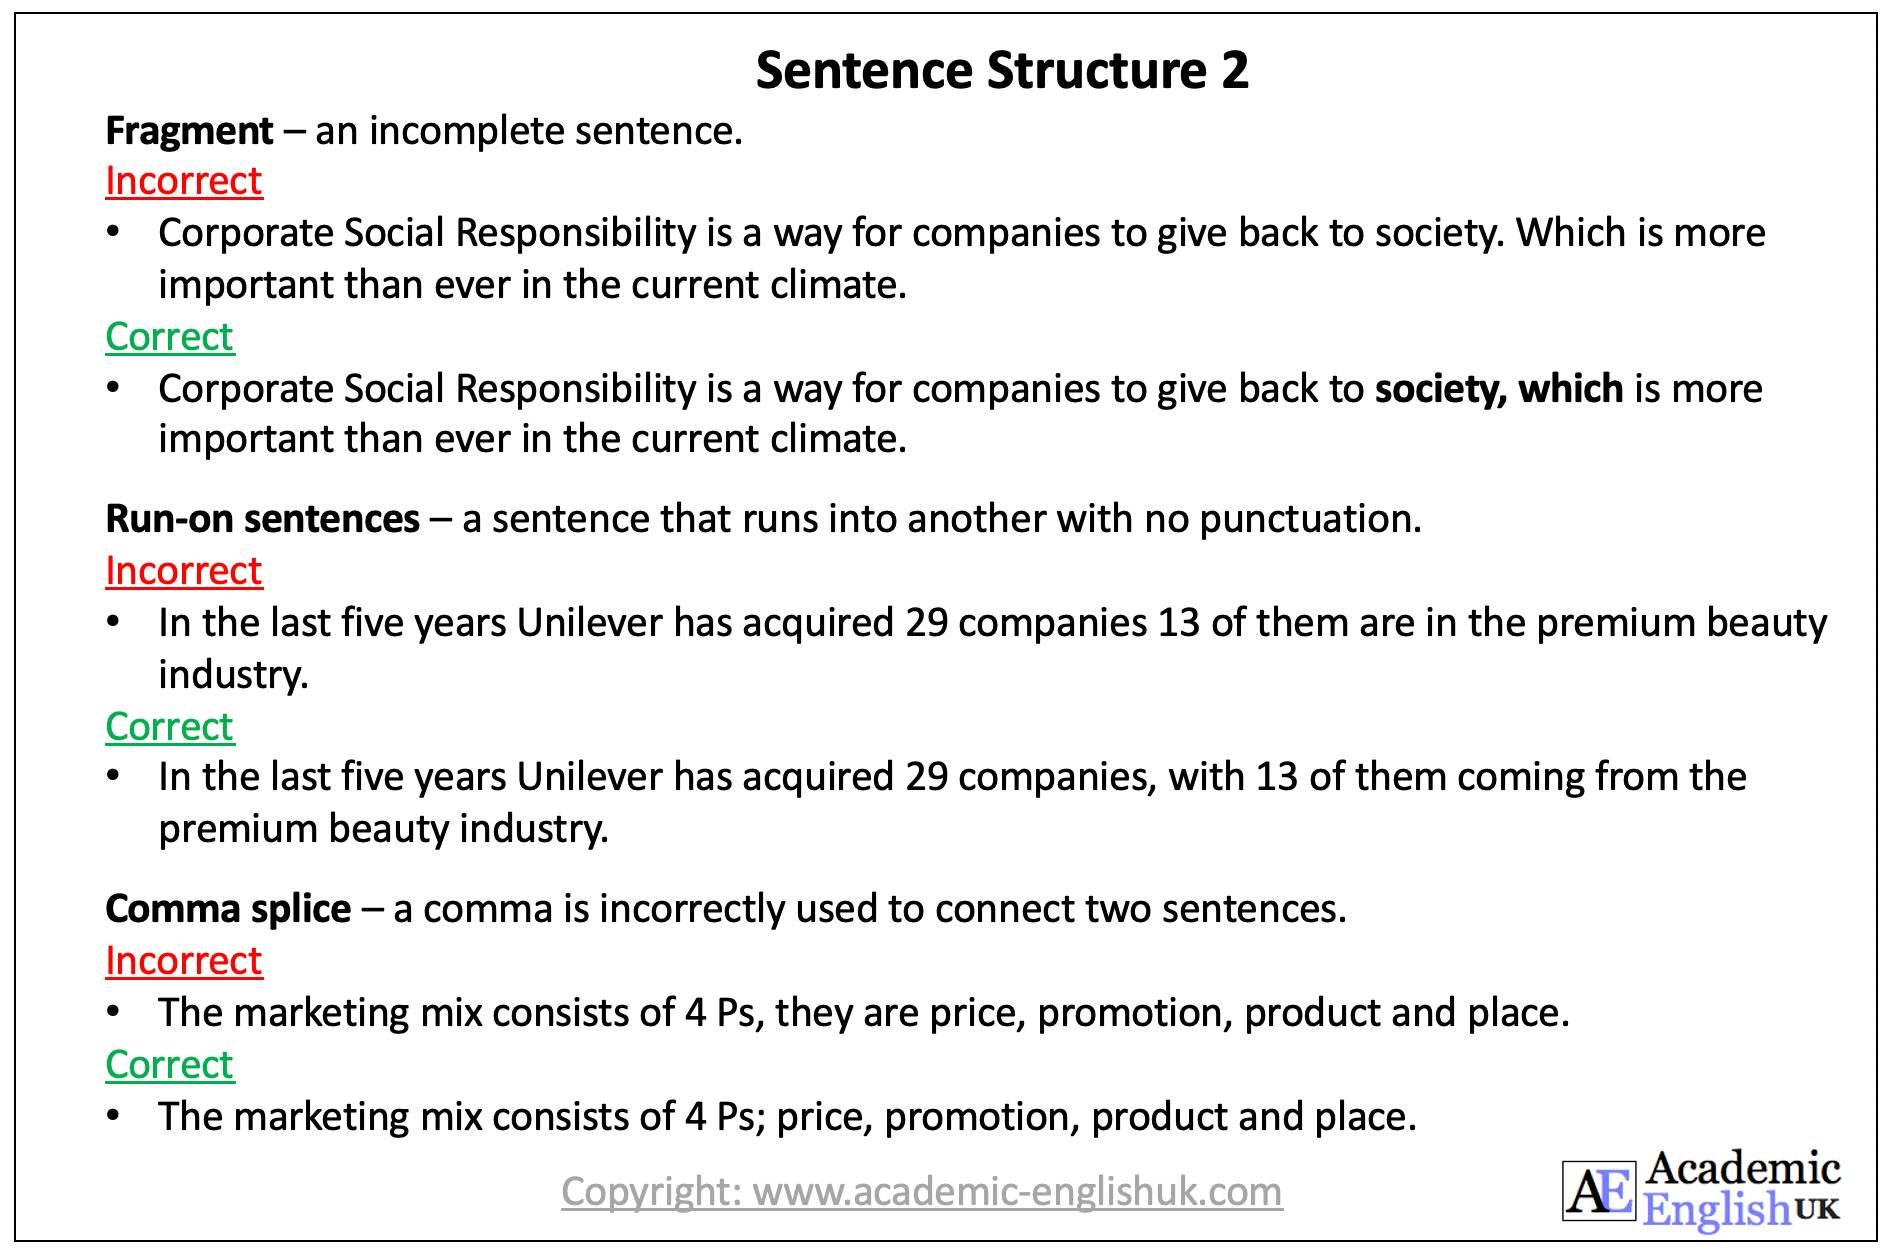 sentence structure 2 Aeuk